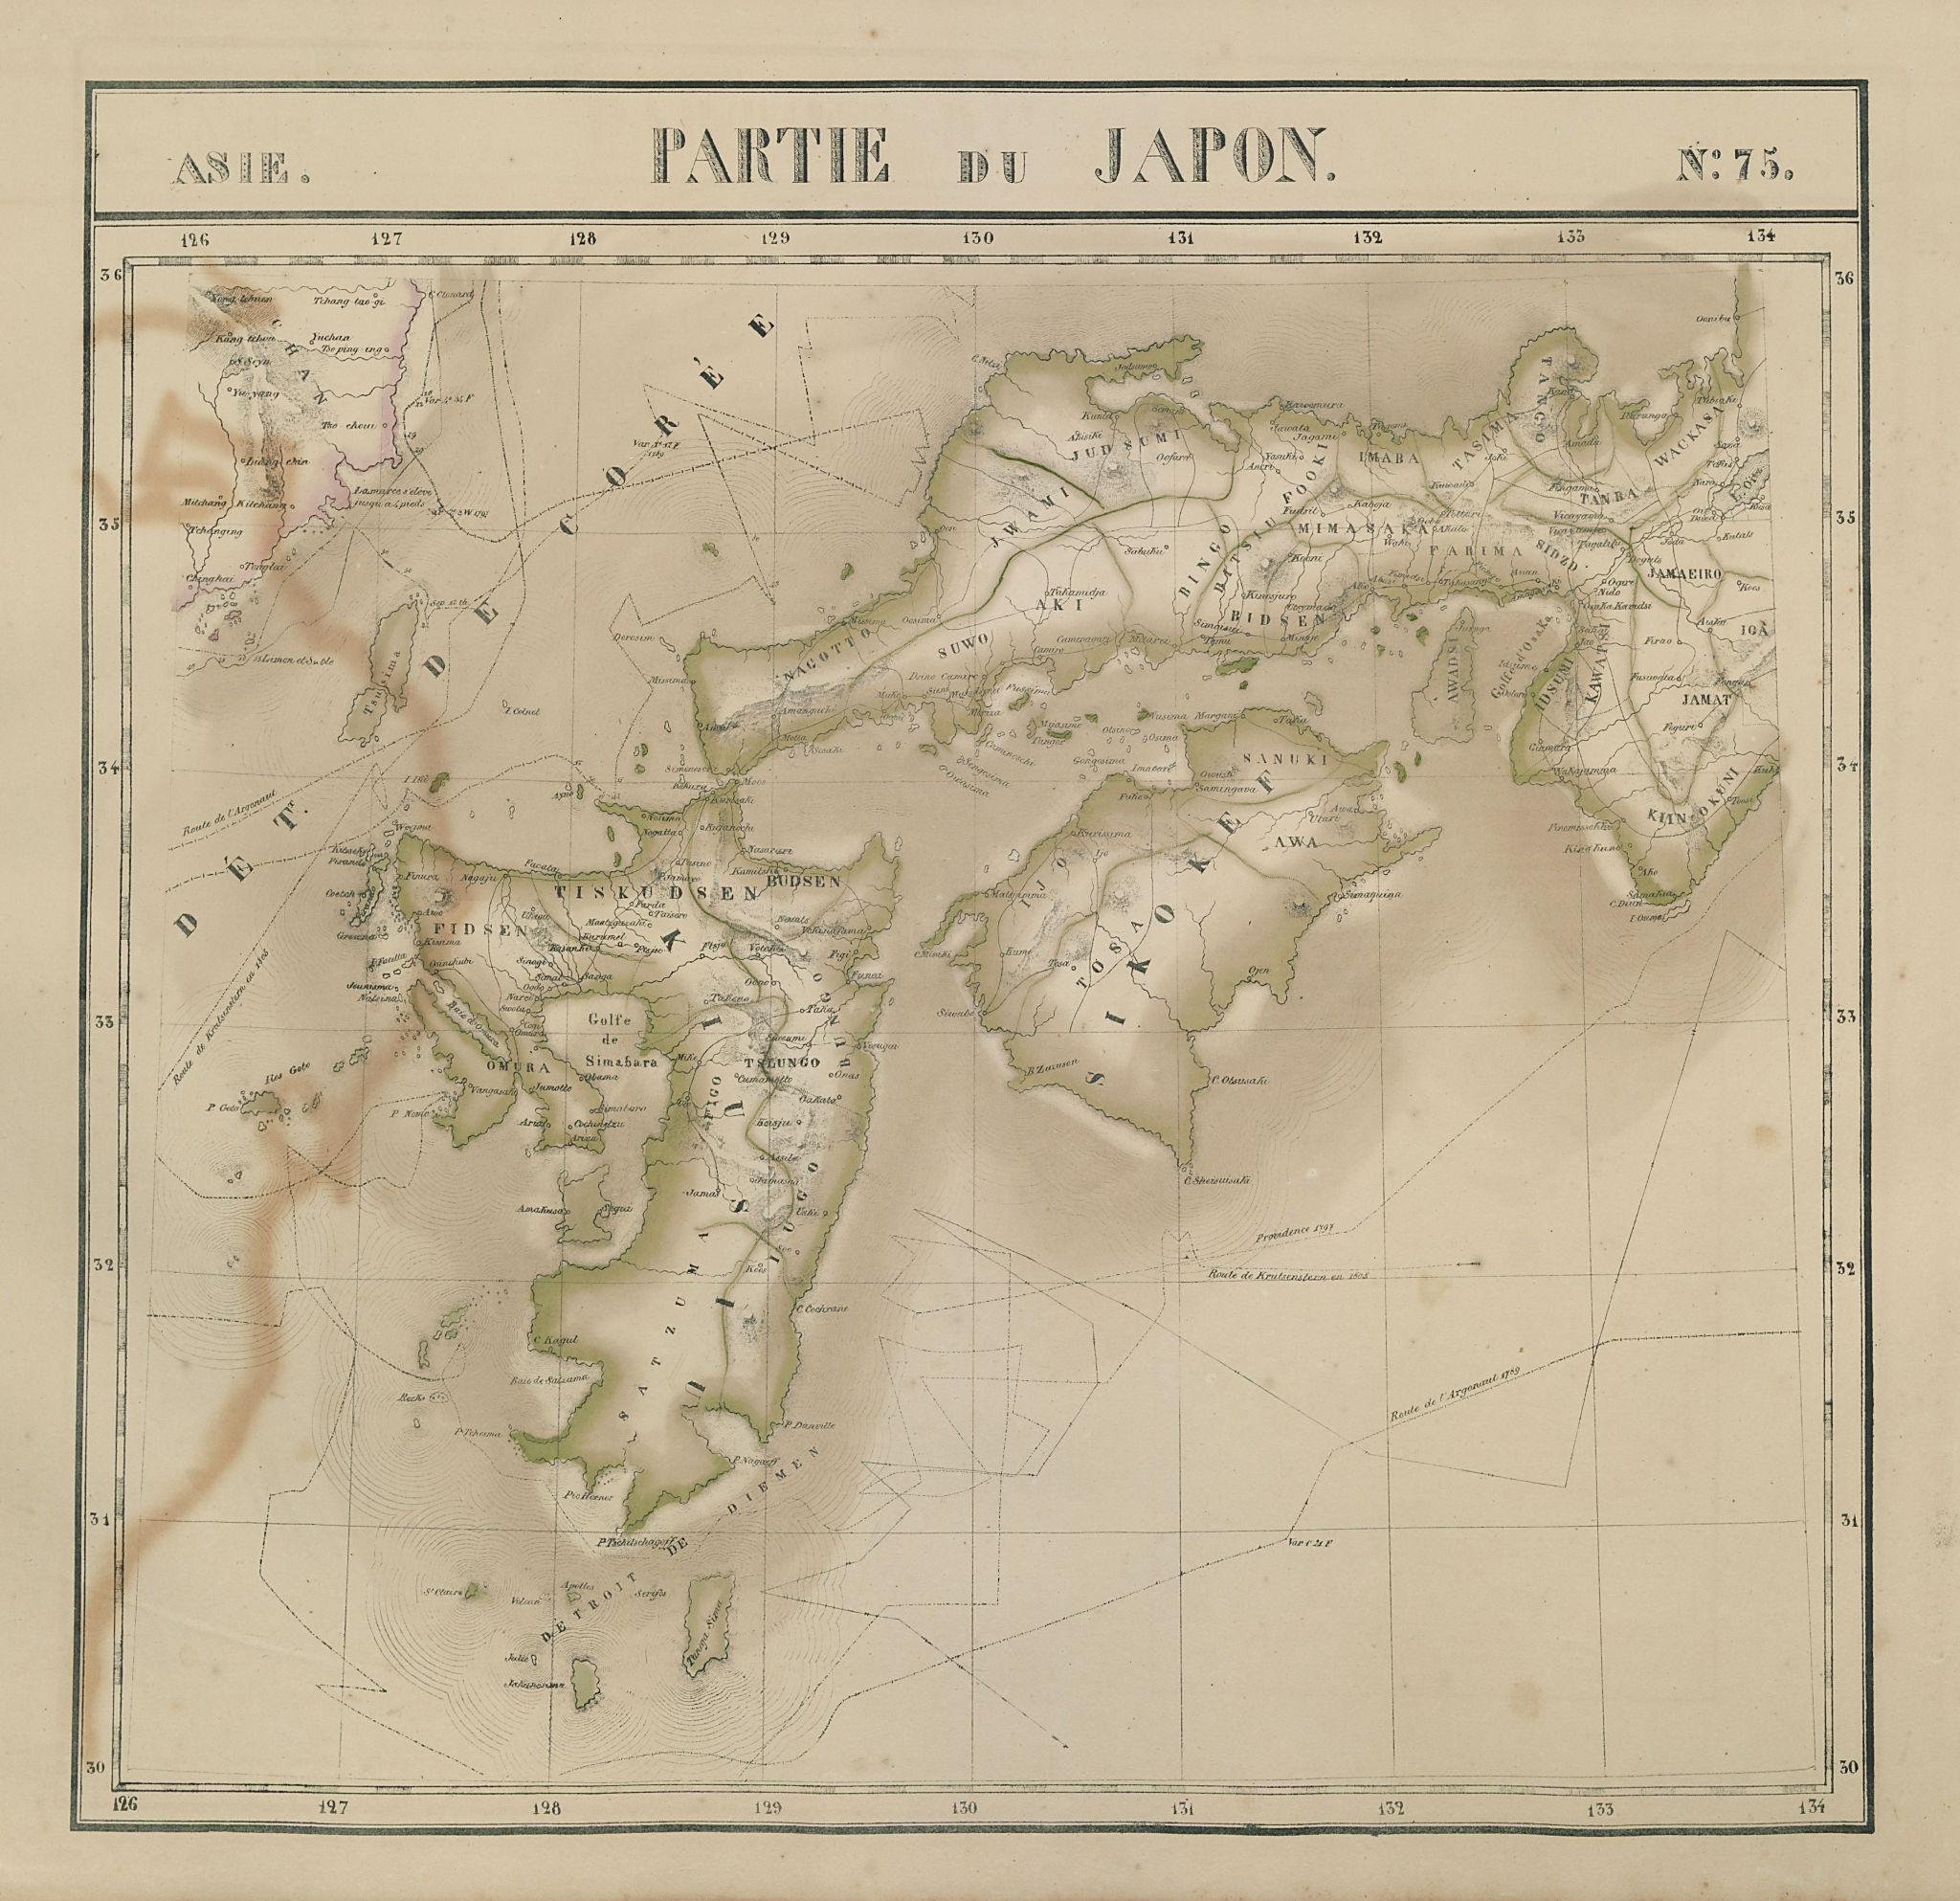 Asie. Japon #75 SW Japan Kyushu Shikoku Chugoku Korea VANDERMAELEN 1827 map